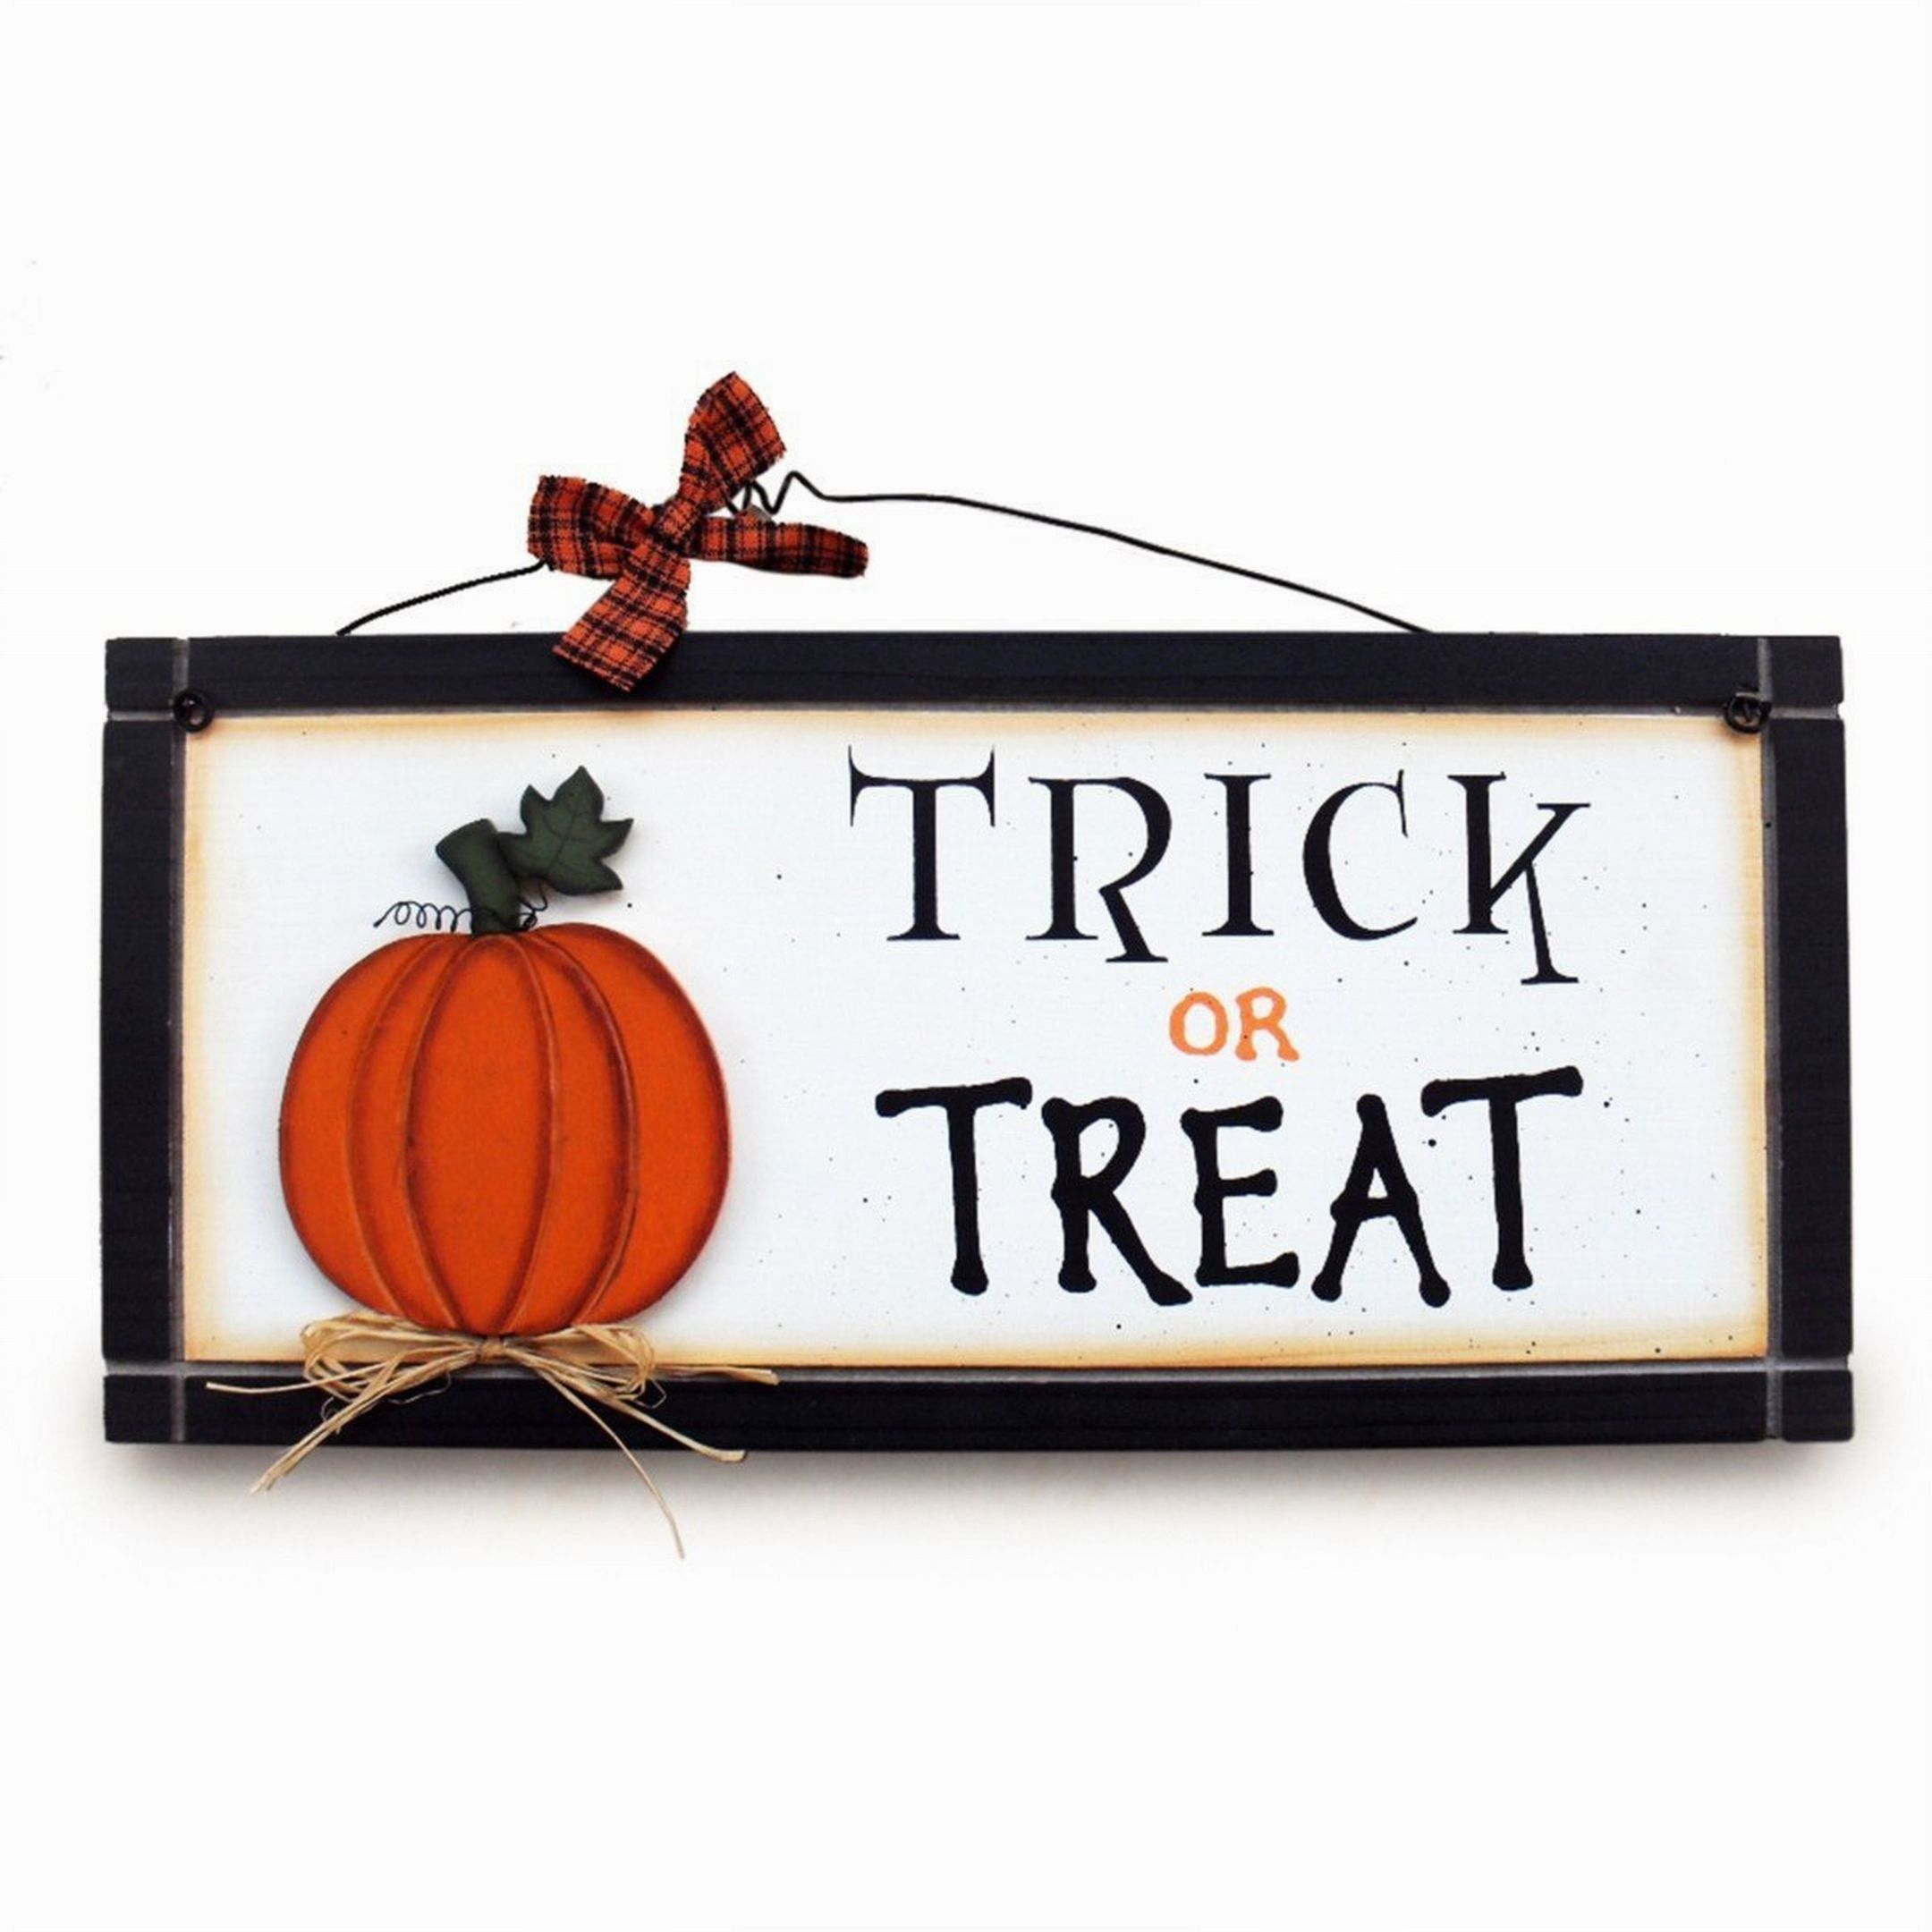 Heartwarmers Fun Trick or Treat Pumpkin Wooden Sign, £7.99 - Amazon